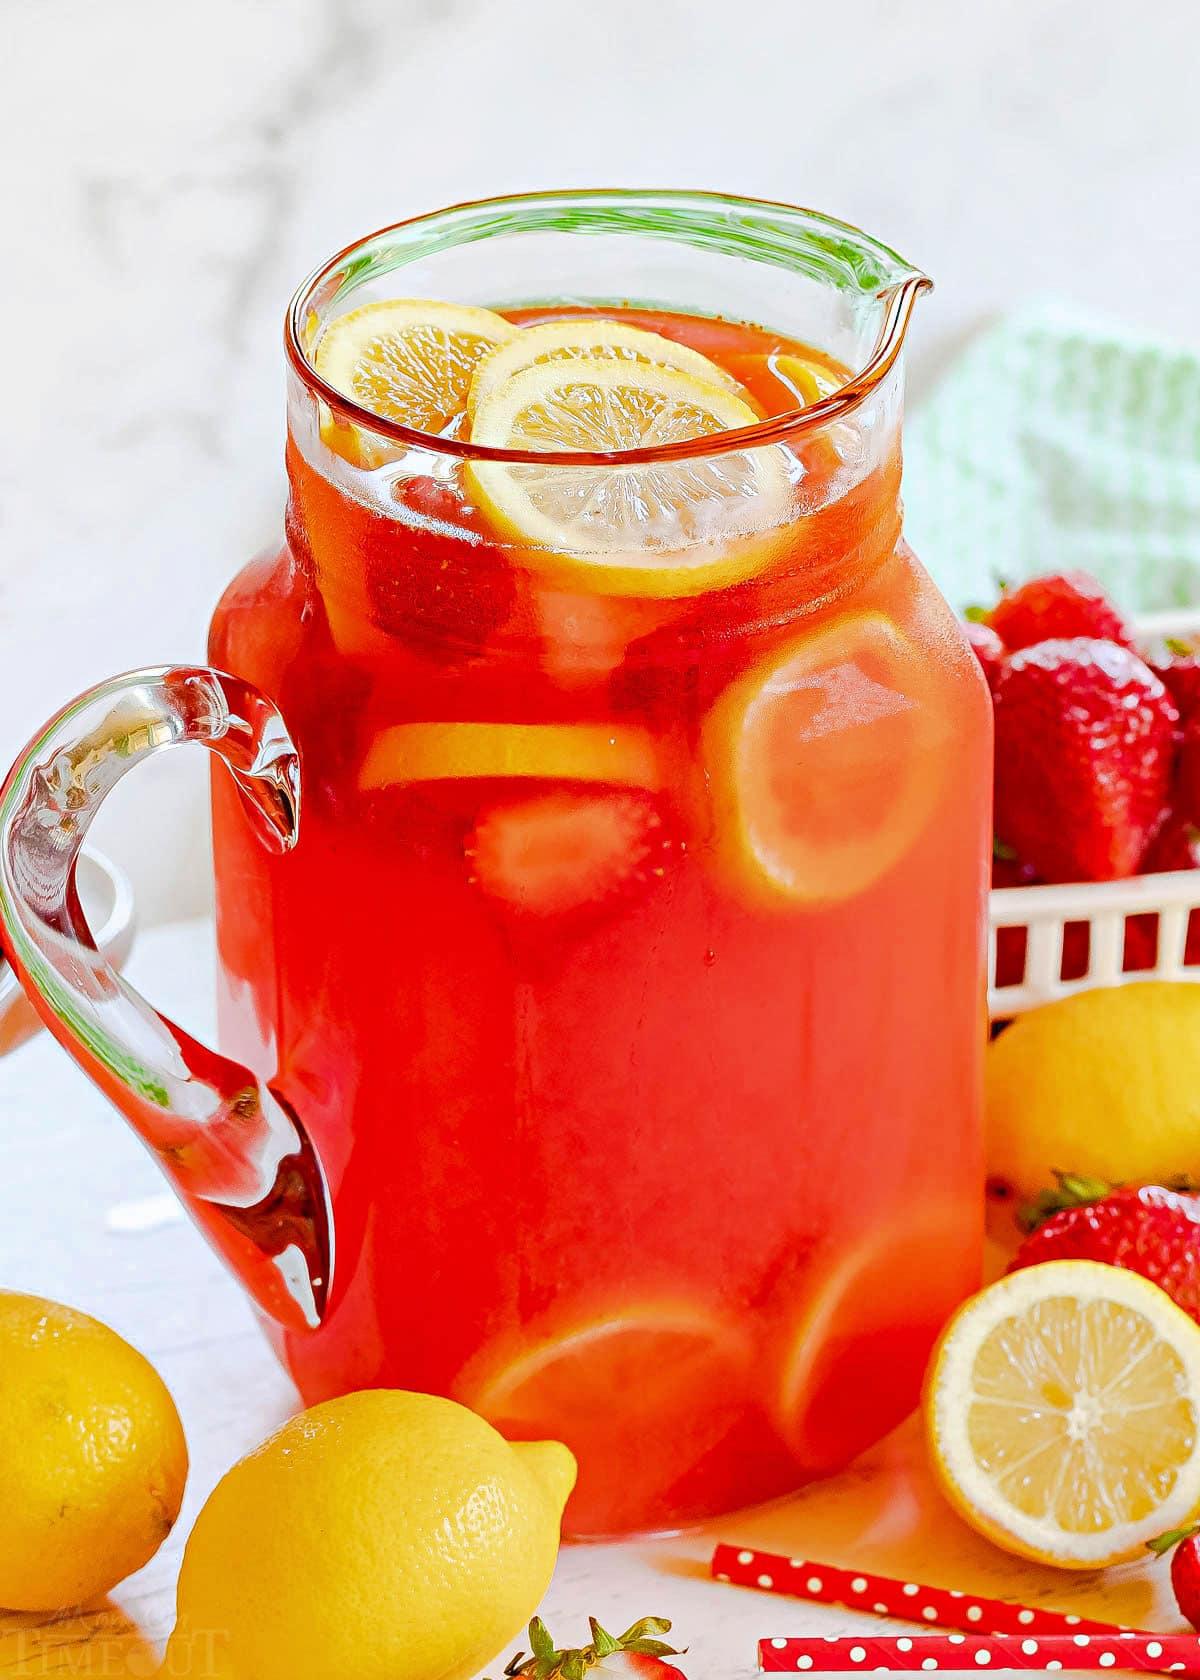 pitcher full of strawberry lemonade with fresh lemon slices and strawberries.